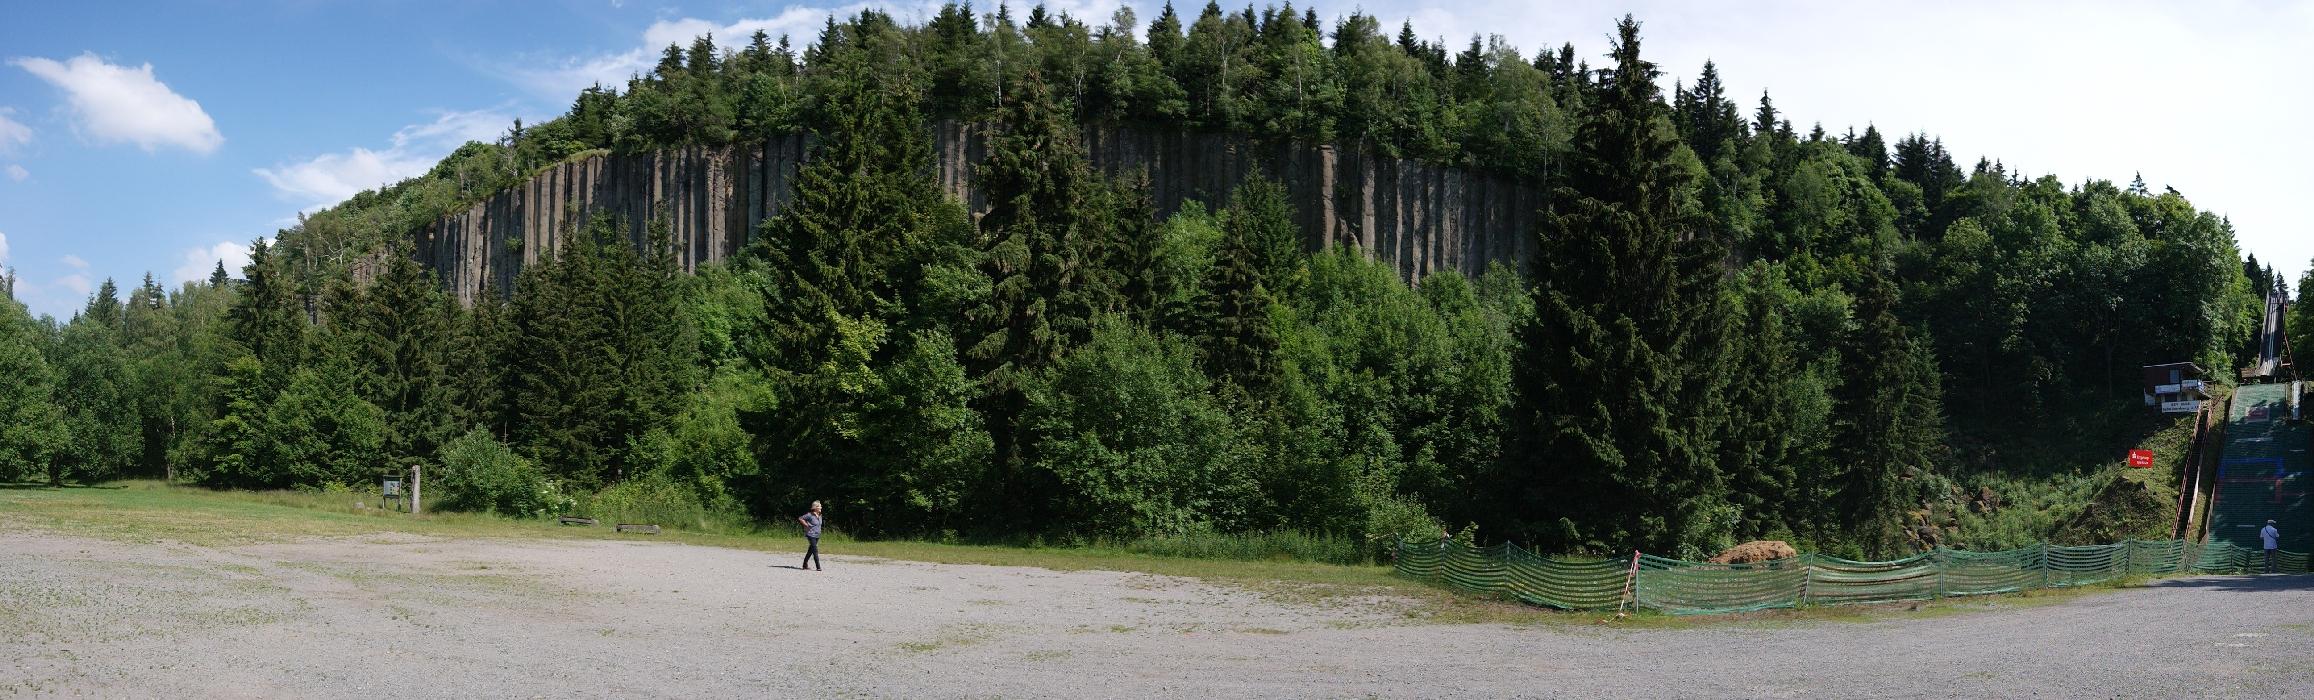 Single erzgebirge